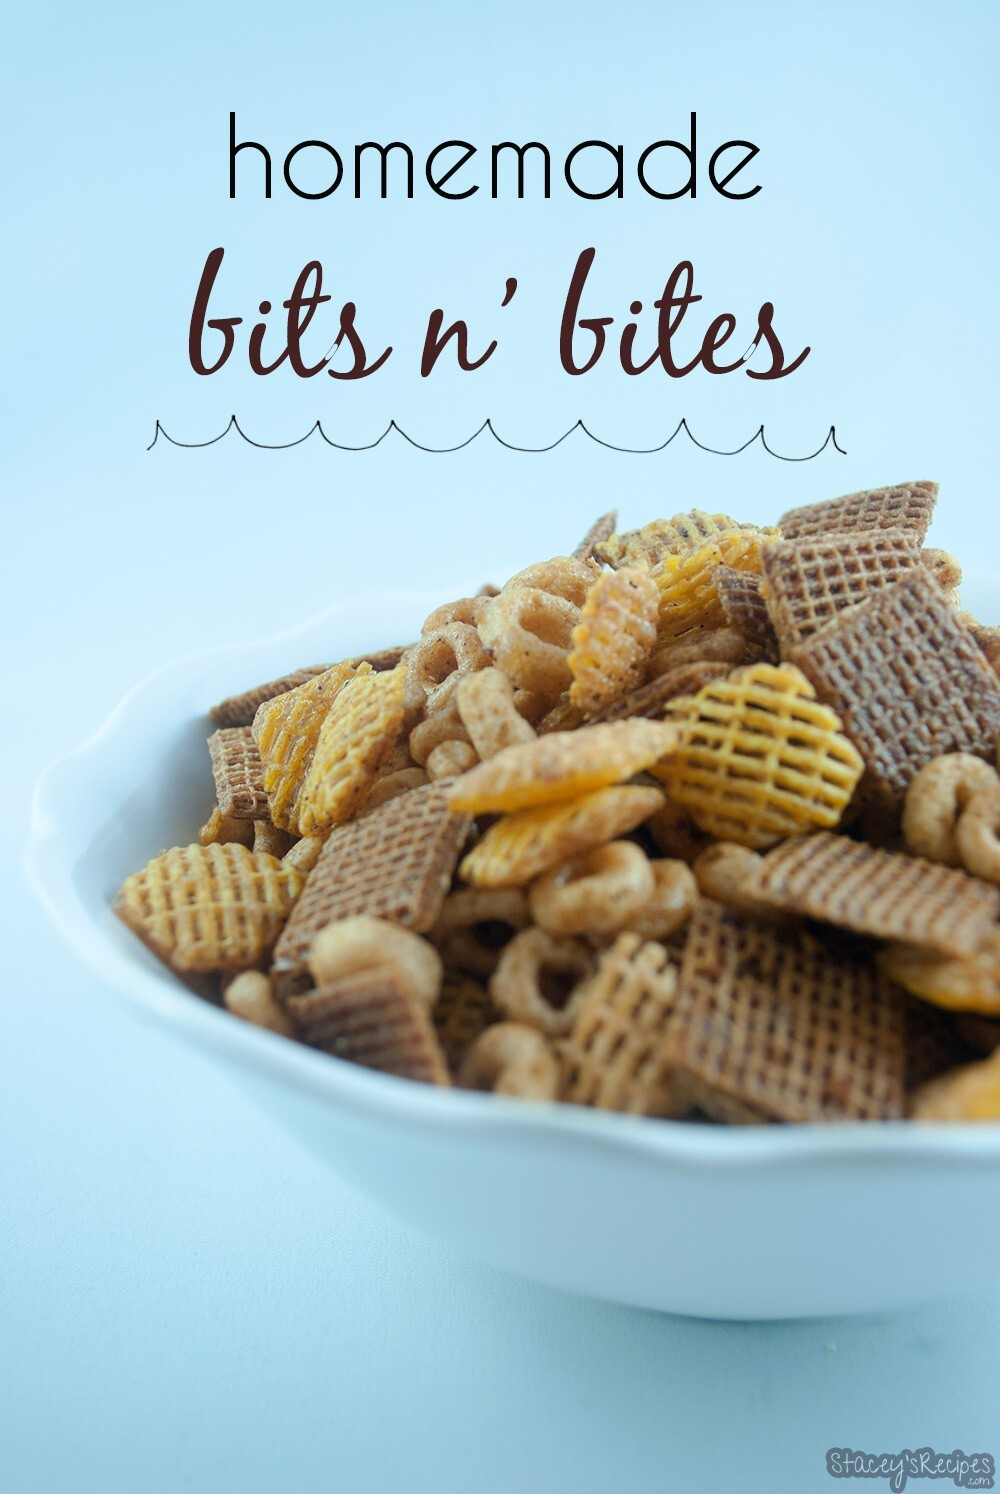 Homemade Bits n' Bites